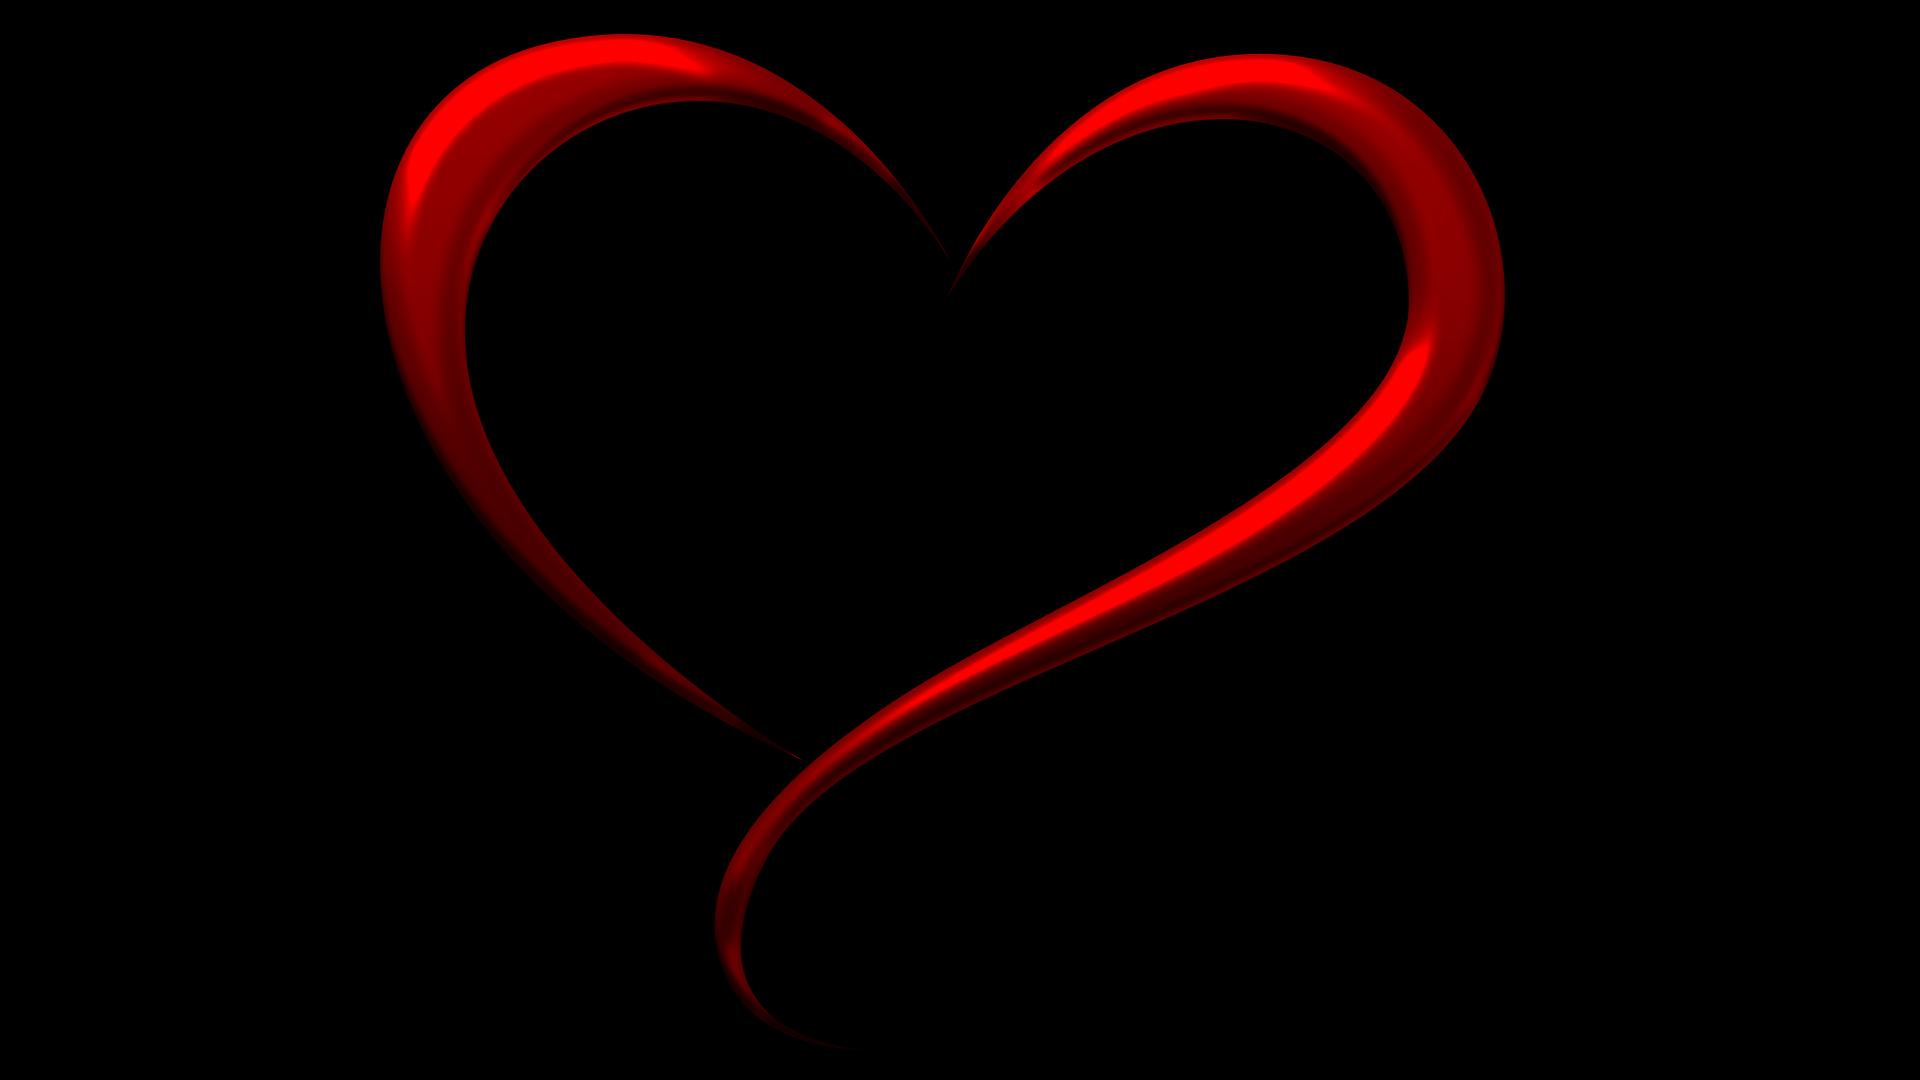 Simple Red Heart Background Fond D'écran HD